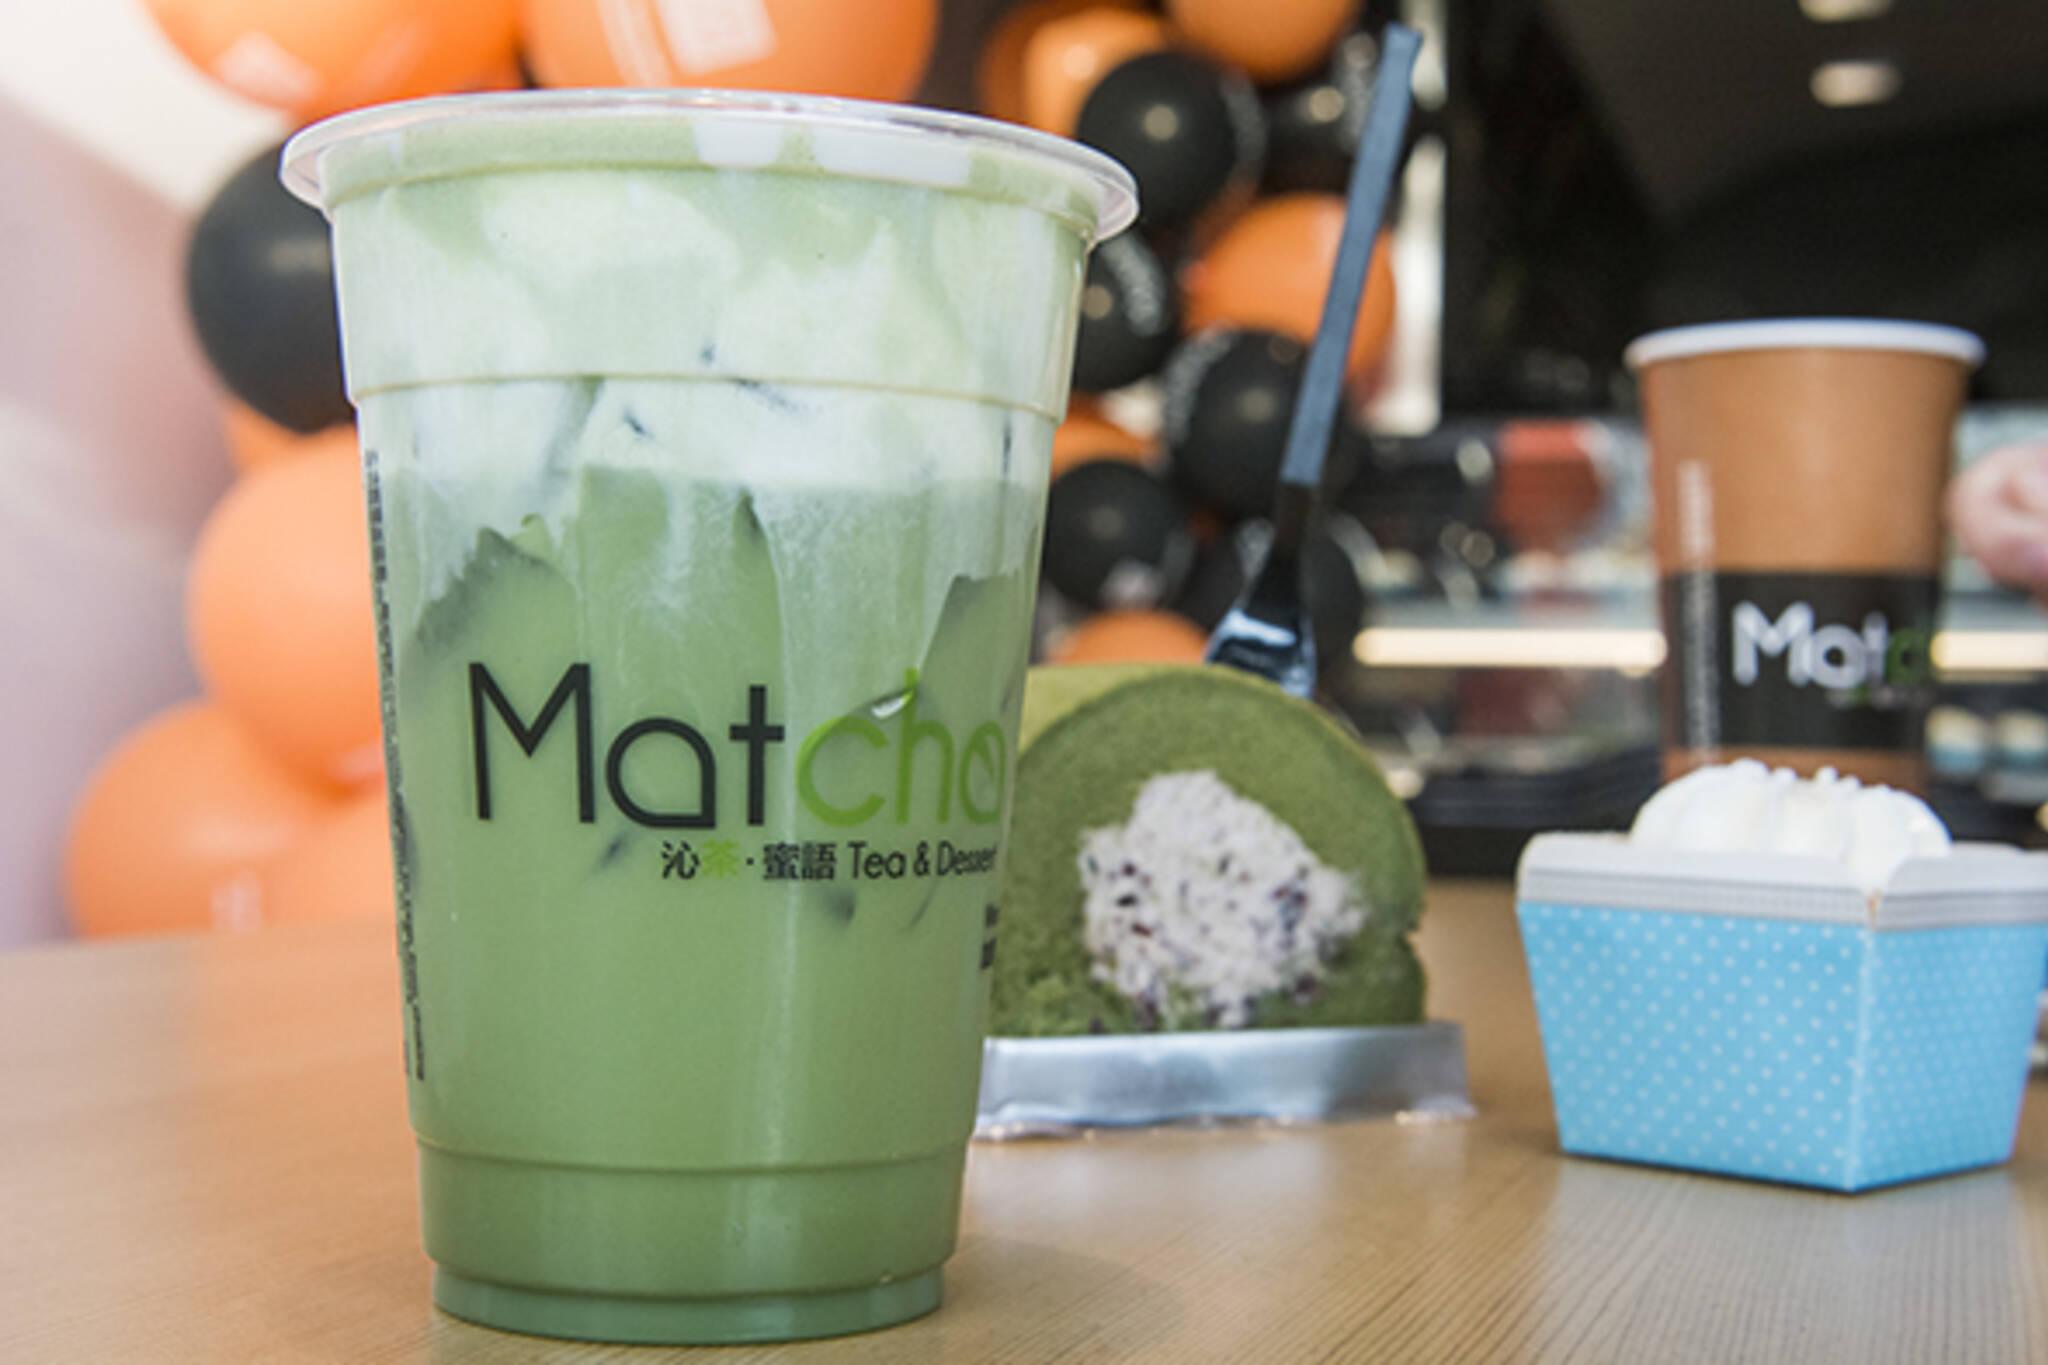 Matcha Tea Dessert Toronto